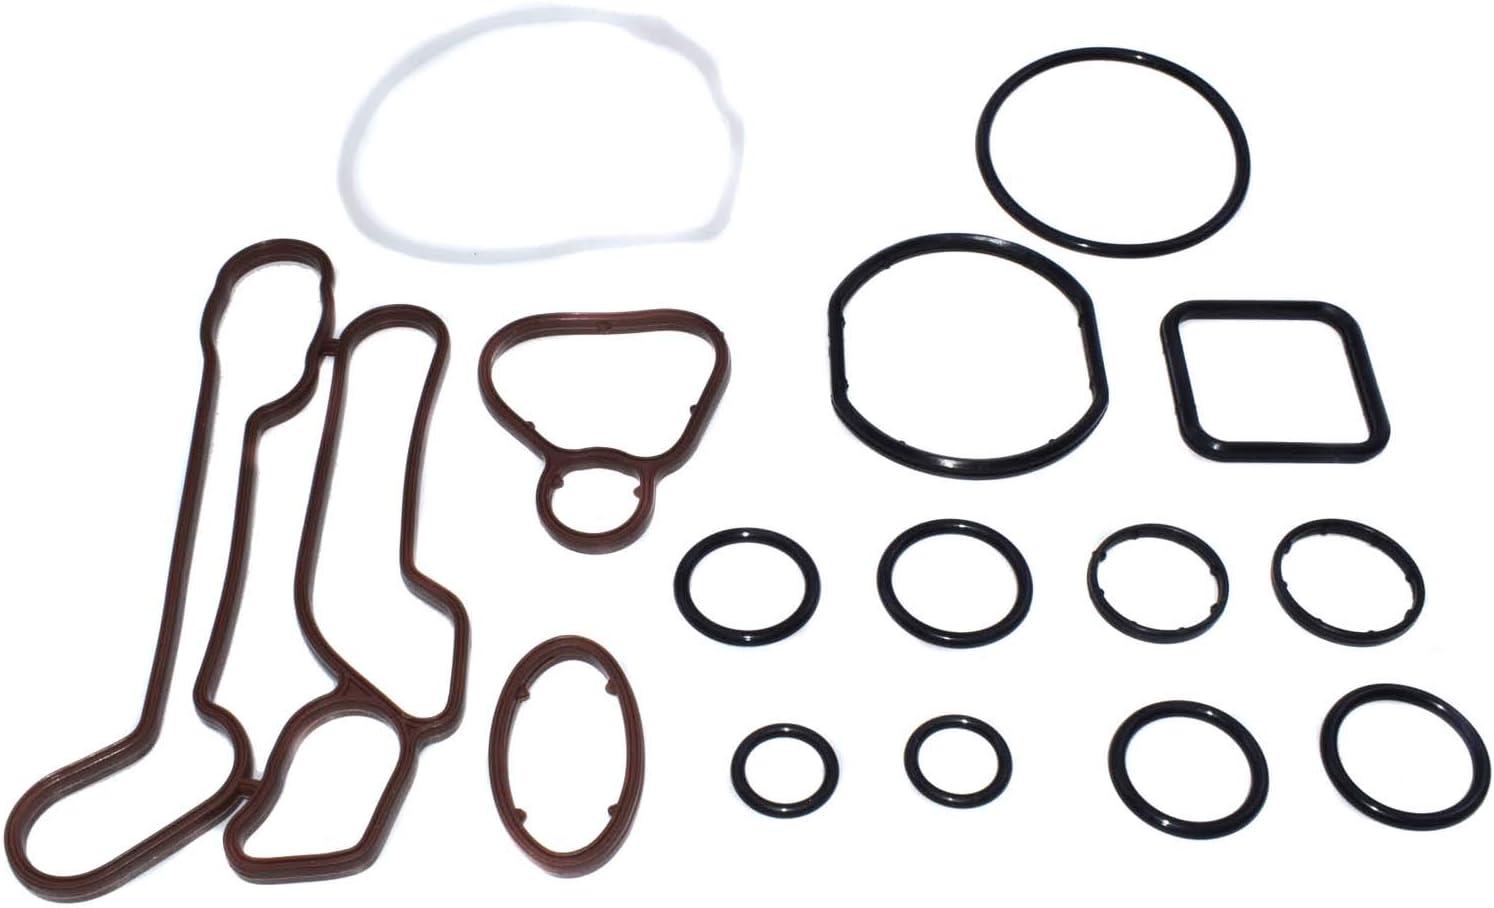 Engine Oil Cooler Gaskets Seals Kit for Chevrolet Cruze Sonic Aveo Pontiac G3